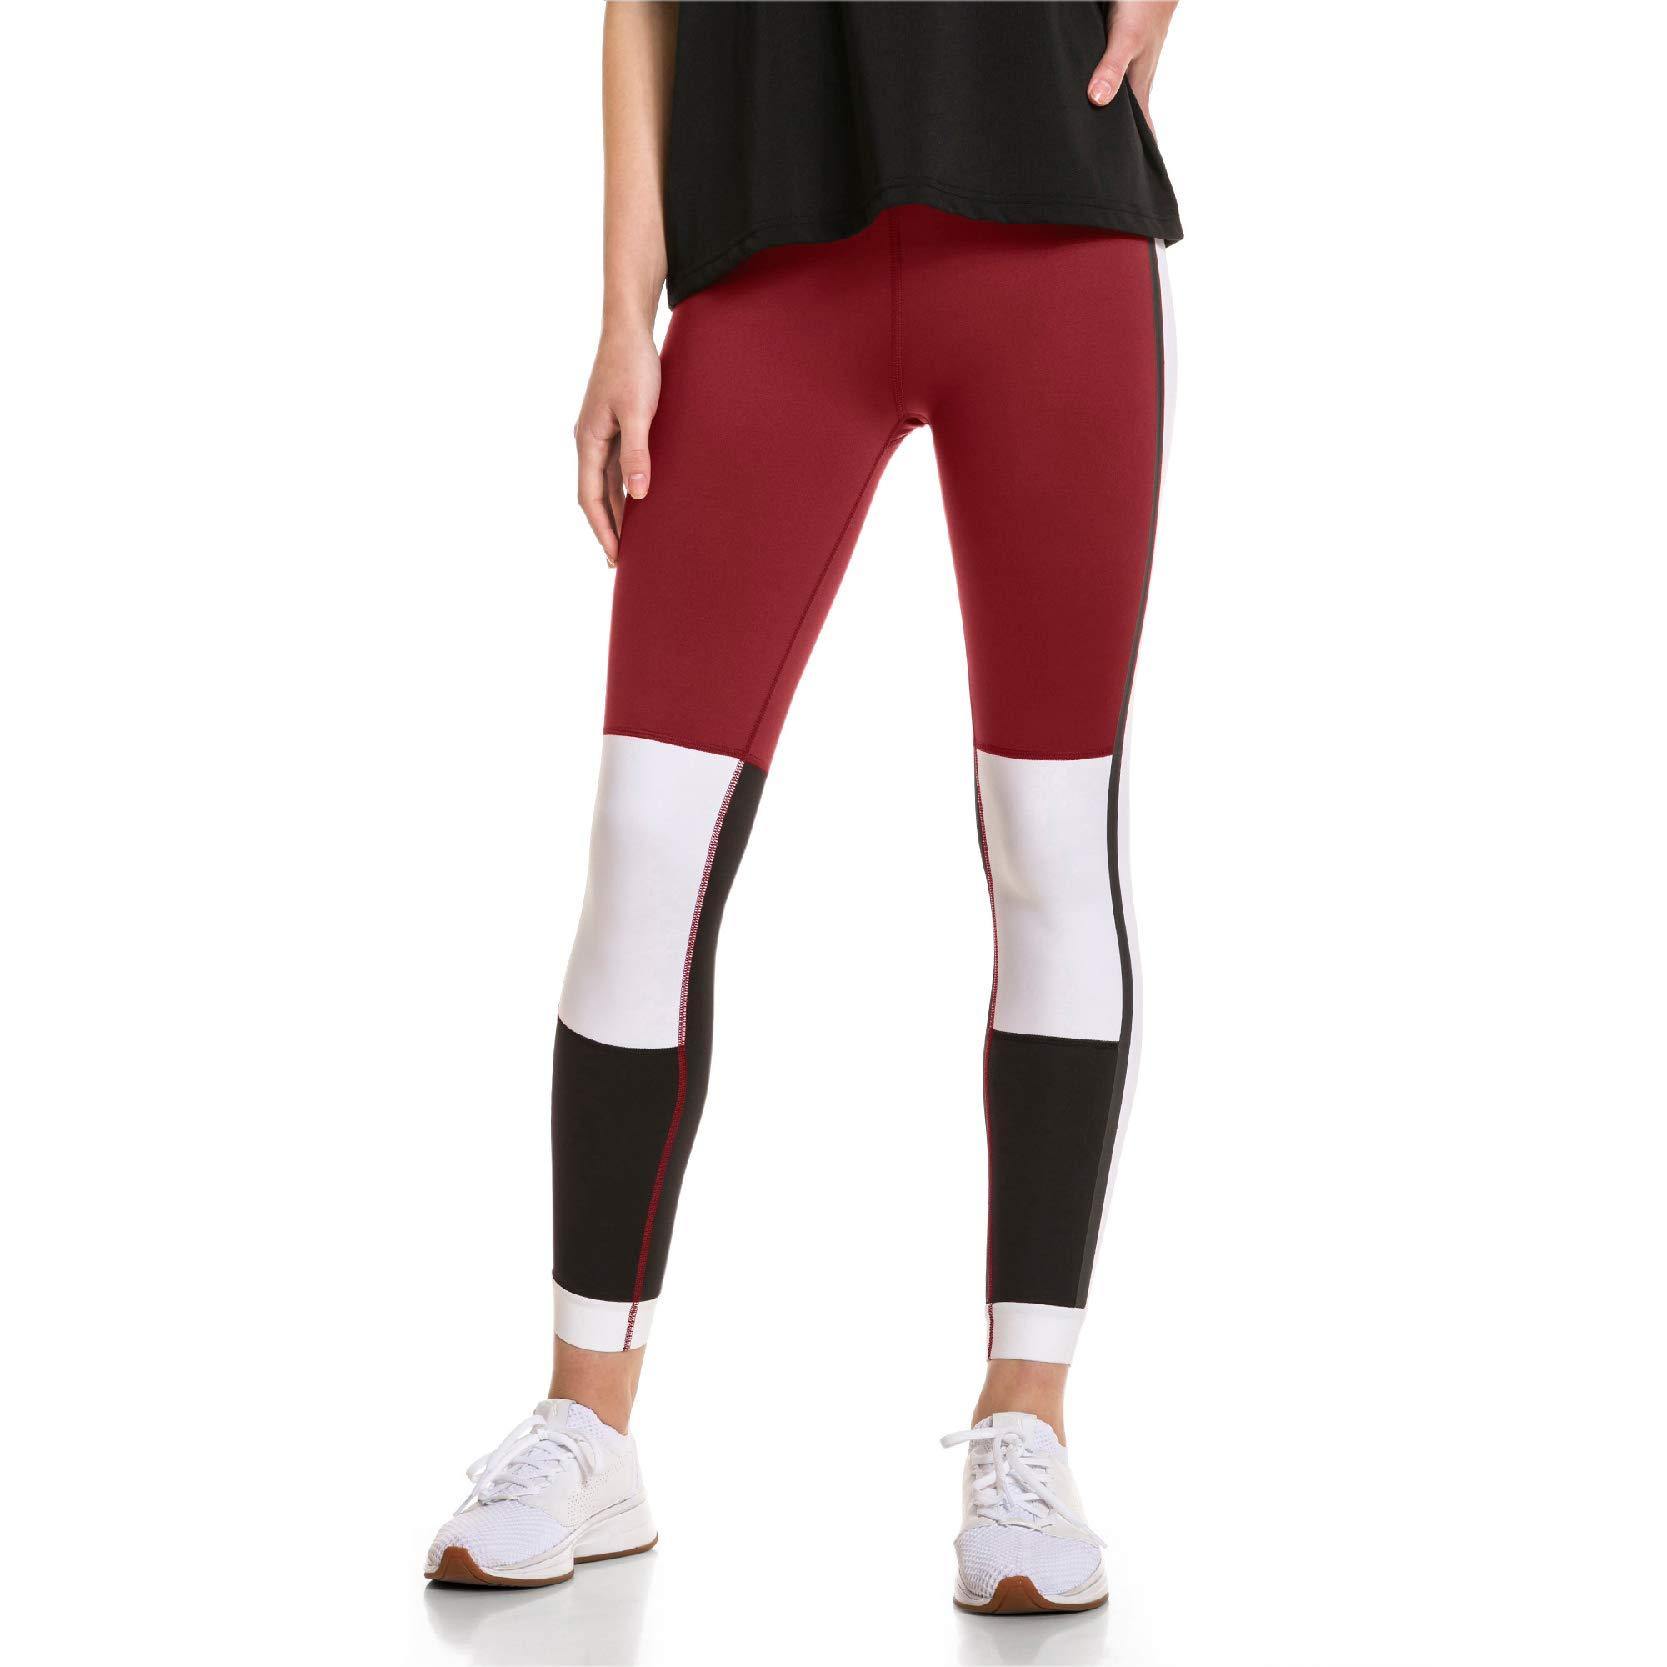 PUMA x Selena Gomez 7/8  Women's Tight Pants